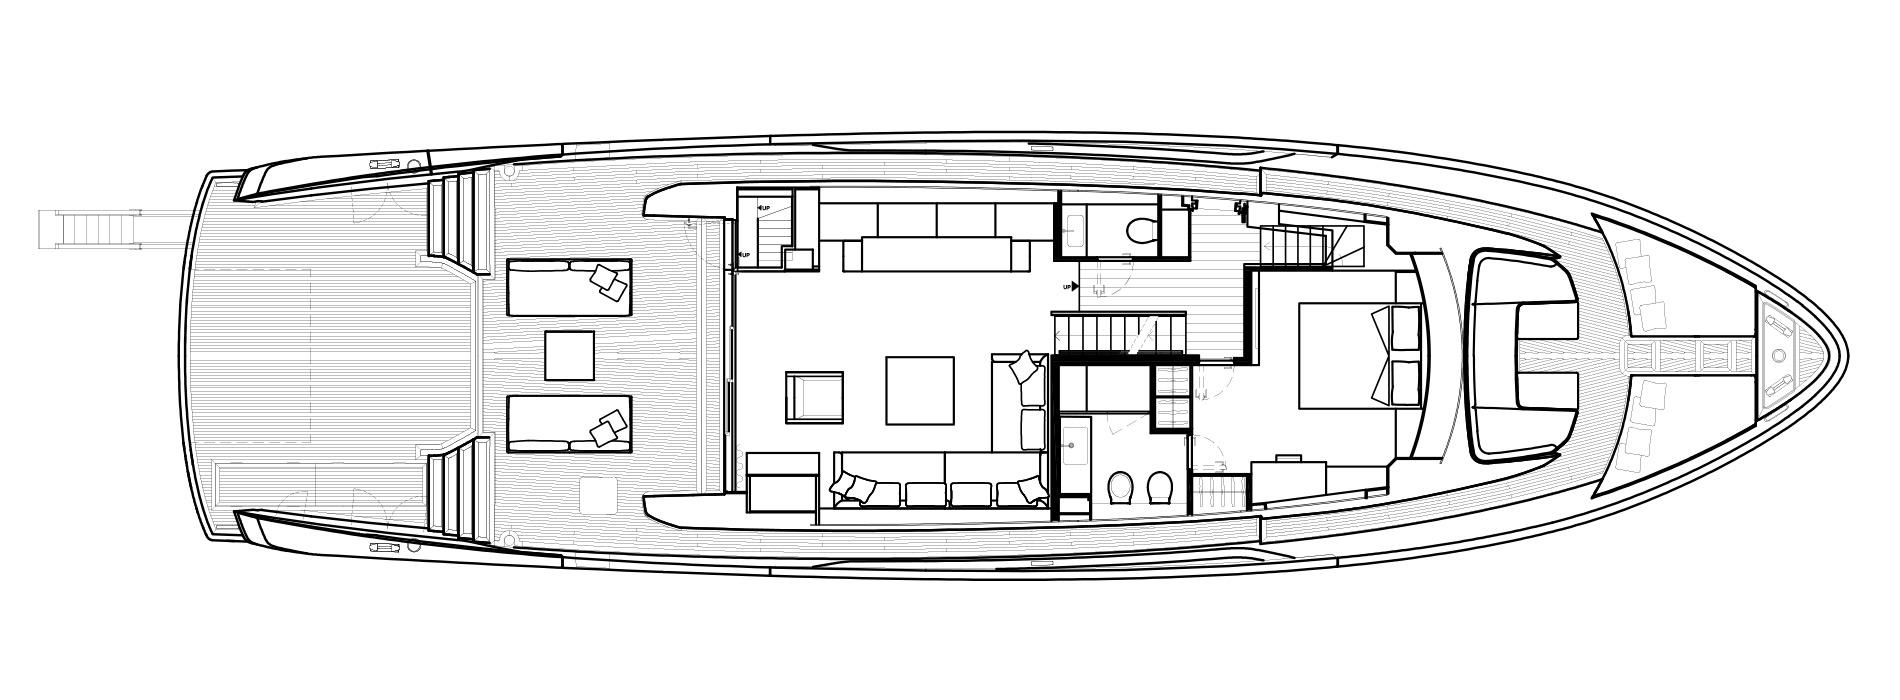 Sanlorenzo Yachts SX88 主甲板 Versione C